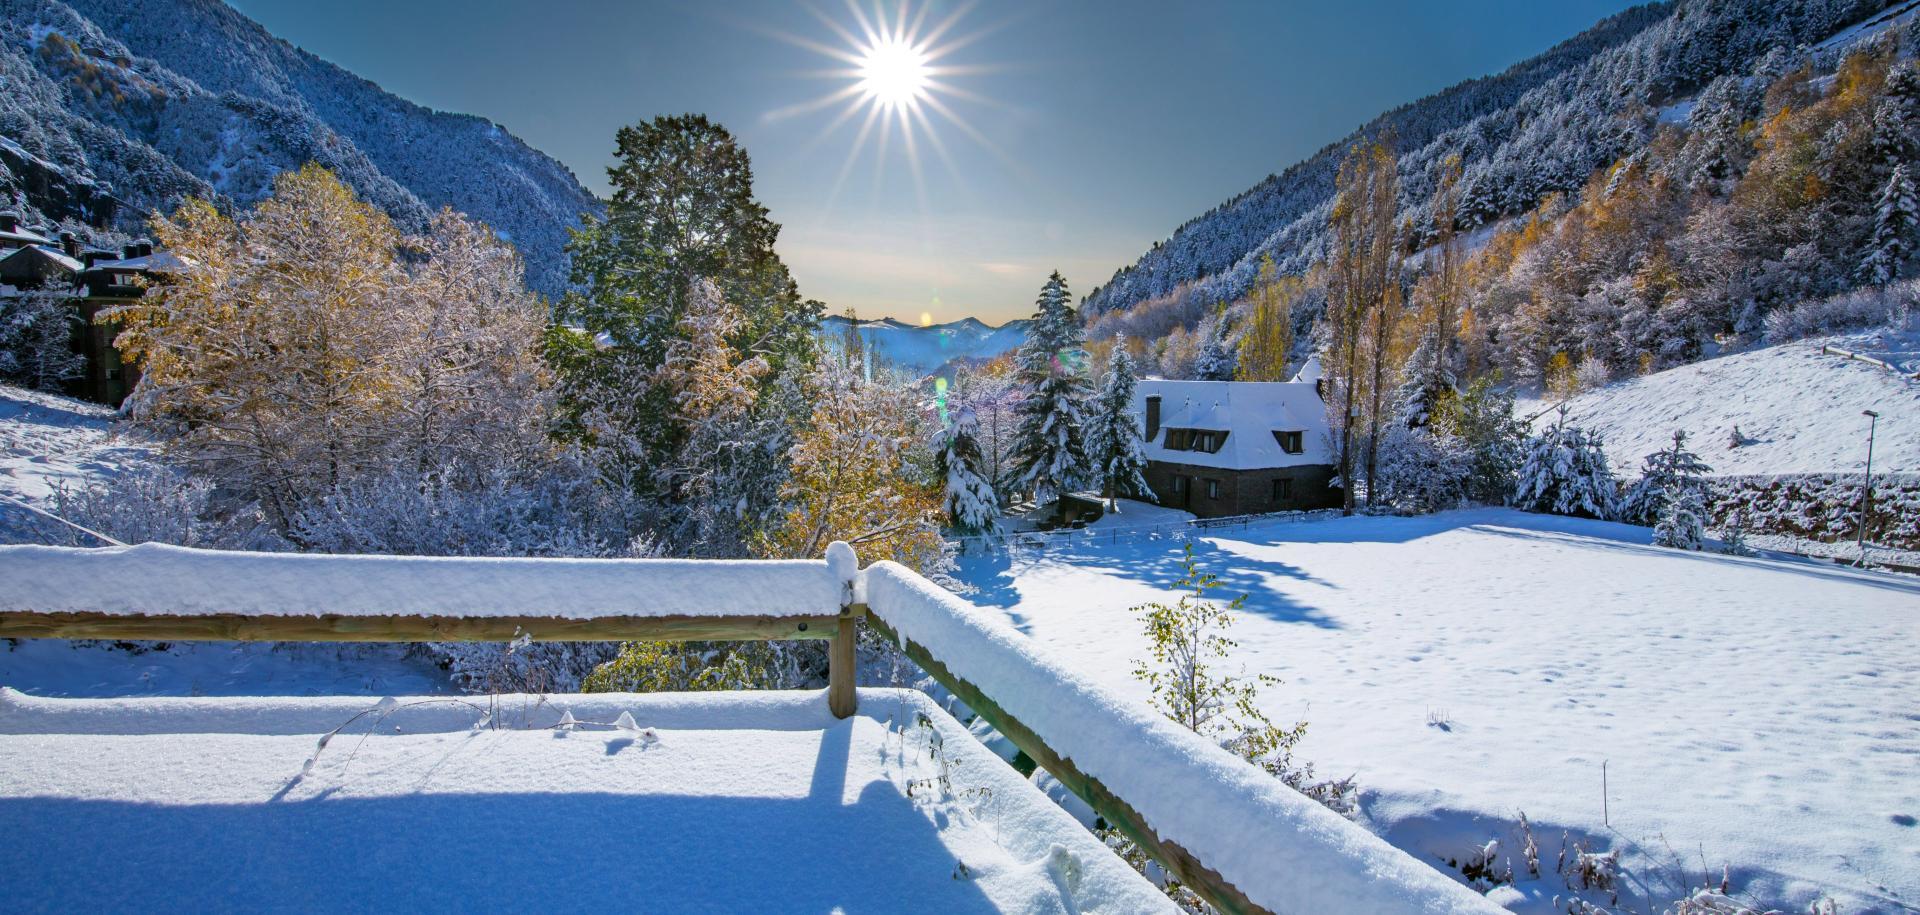 Andorra snowy mountains